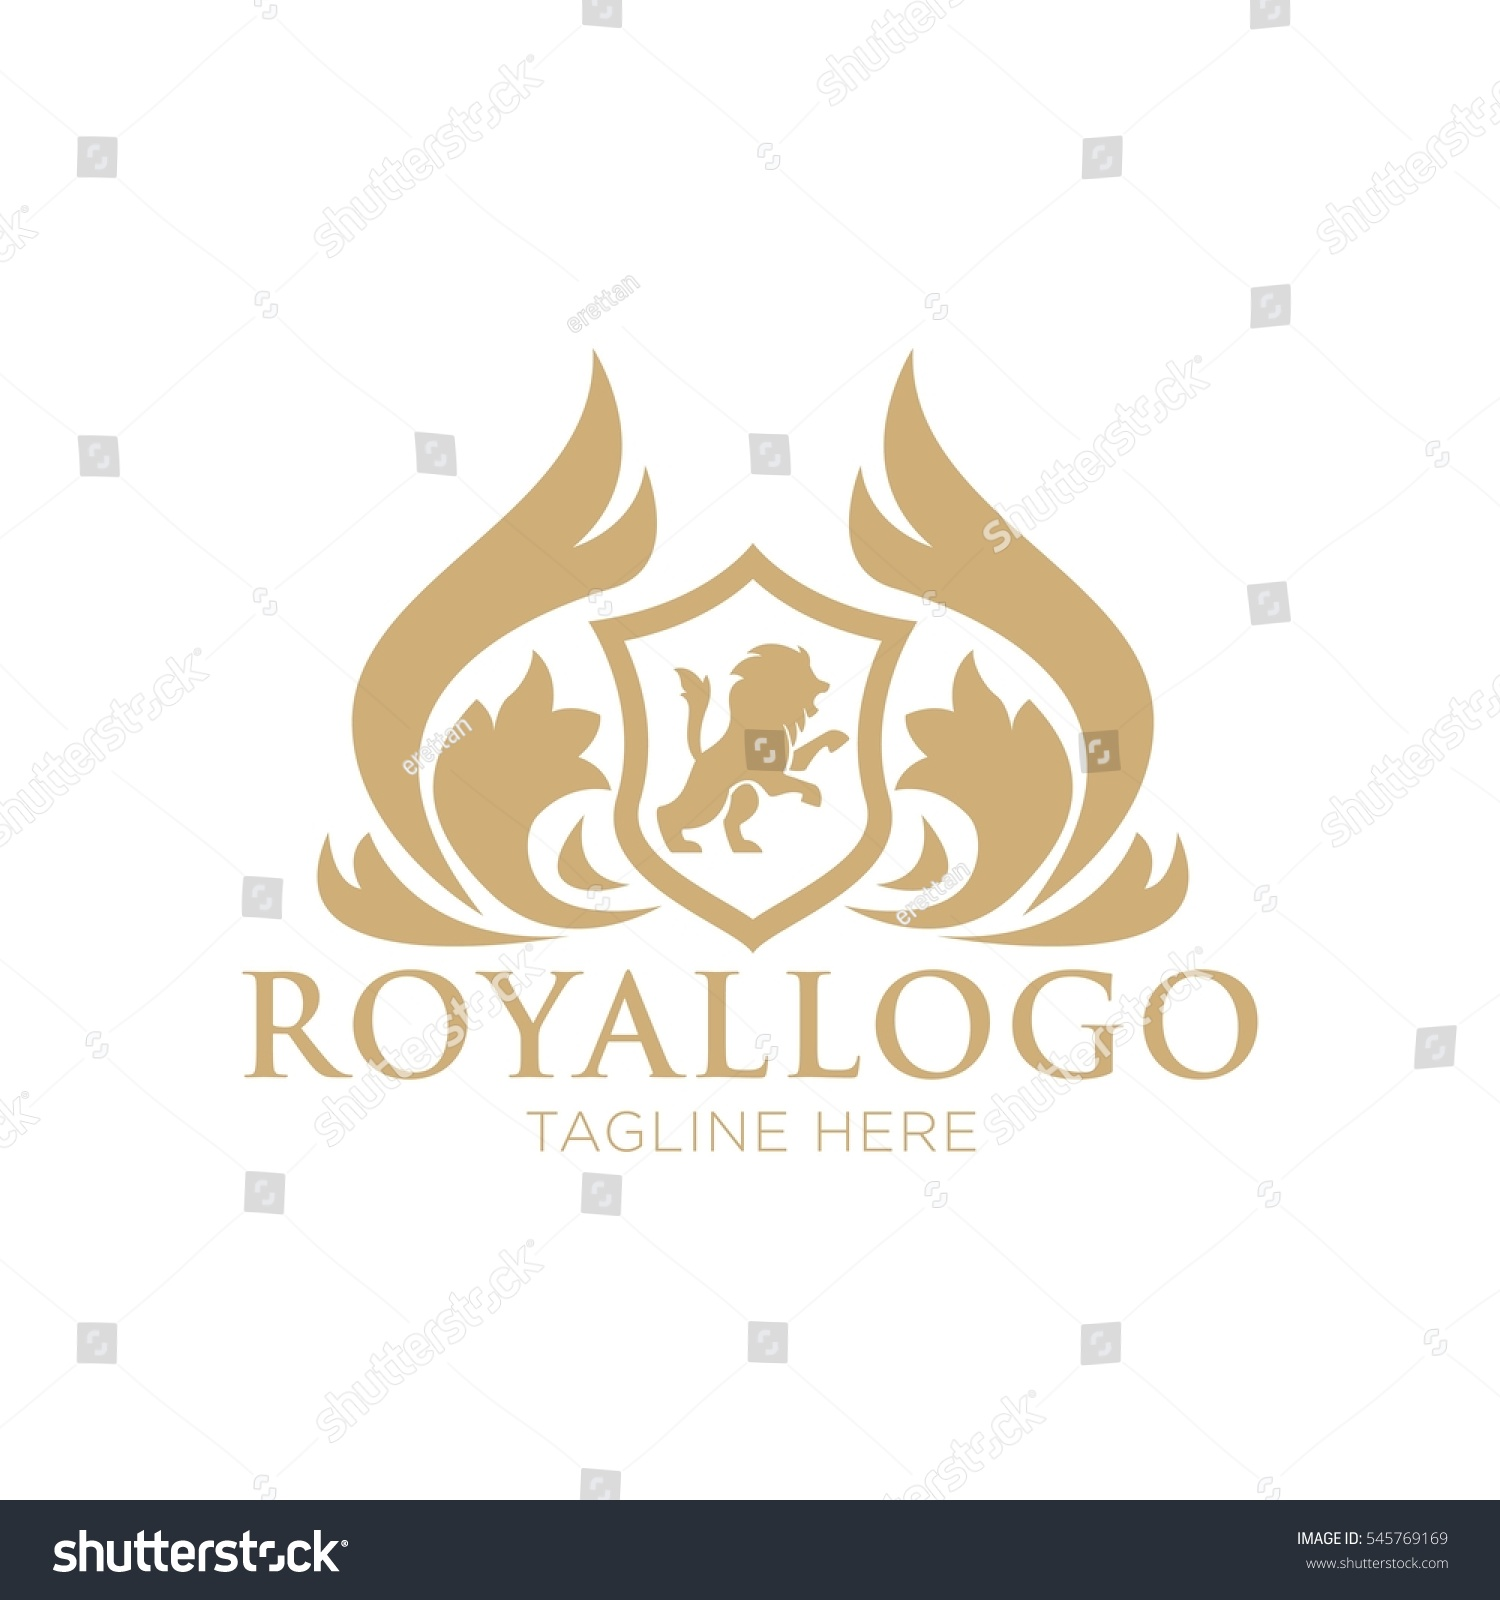 royal logo design template stock vector 545769169 shutterstock. Black Bedroom Furniture Sets. Home Design Ideas